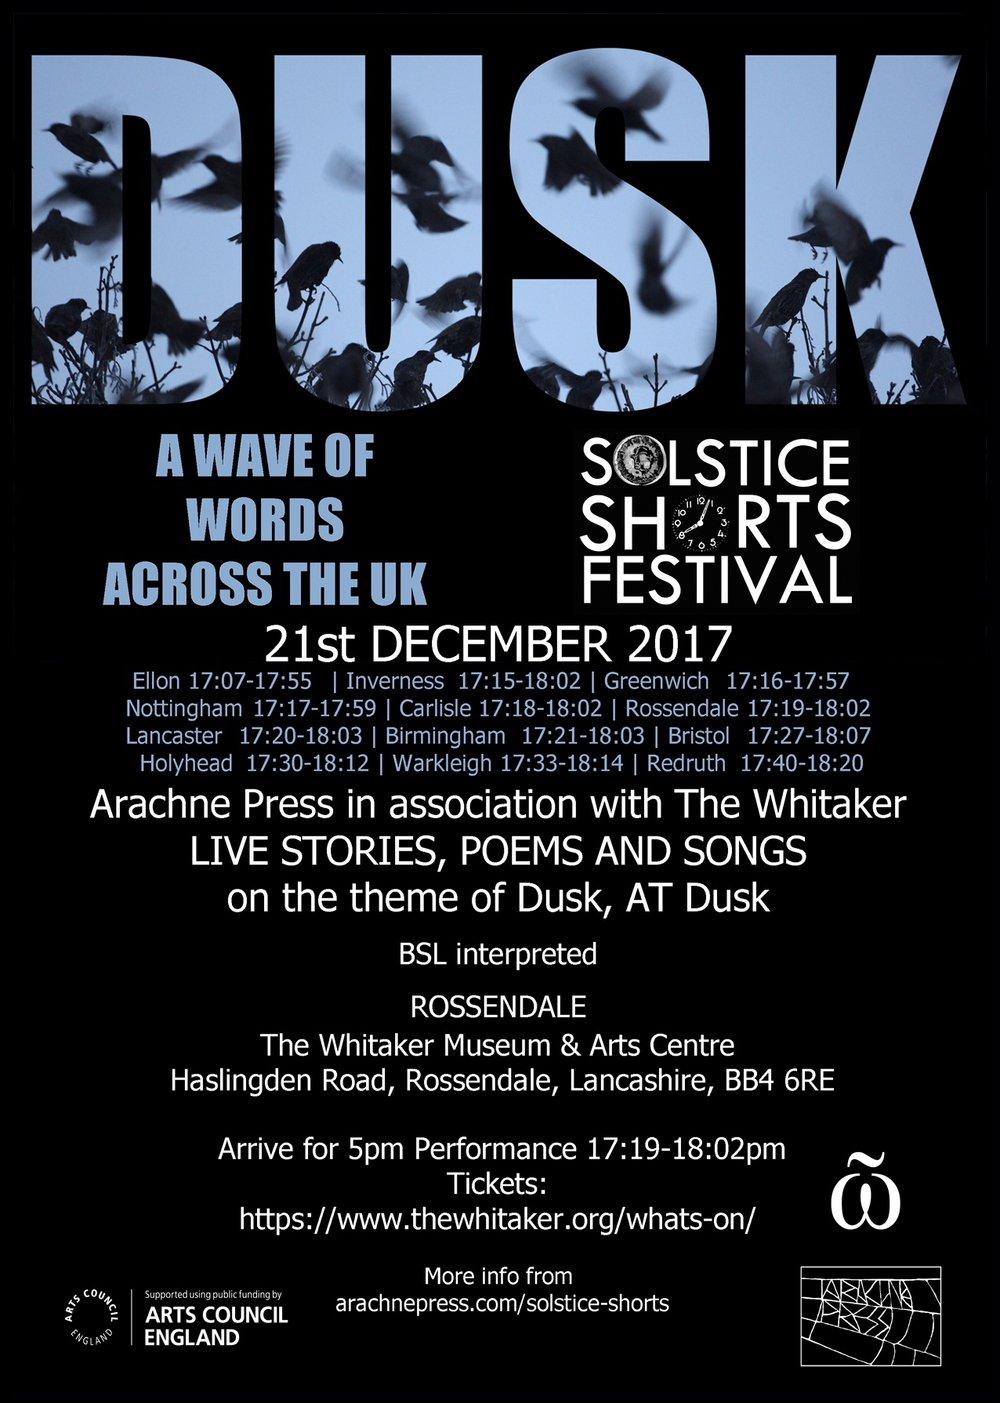 DUSK Soltice Shorts Festival ROSSENDALE